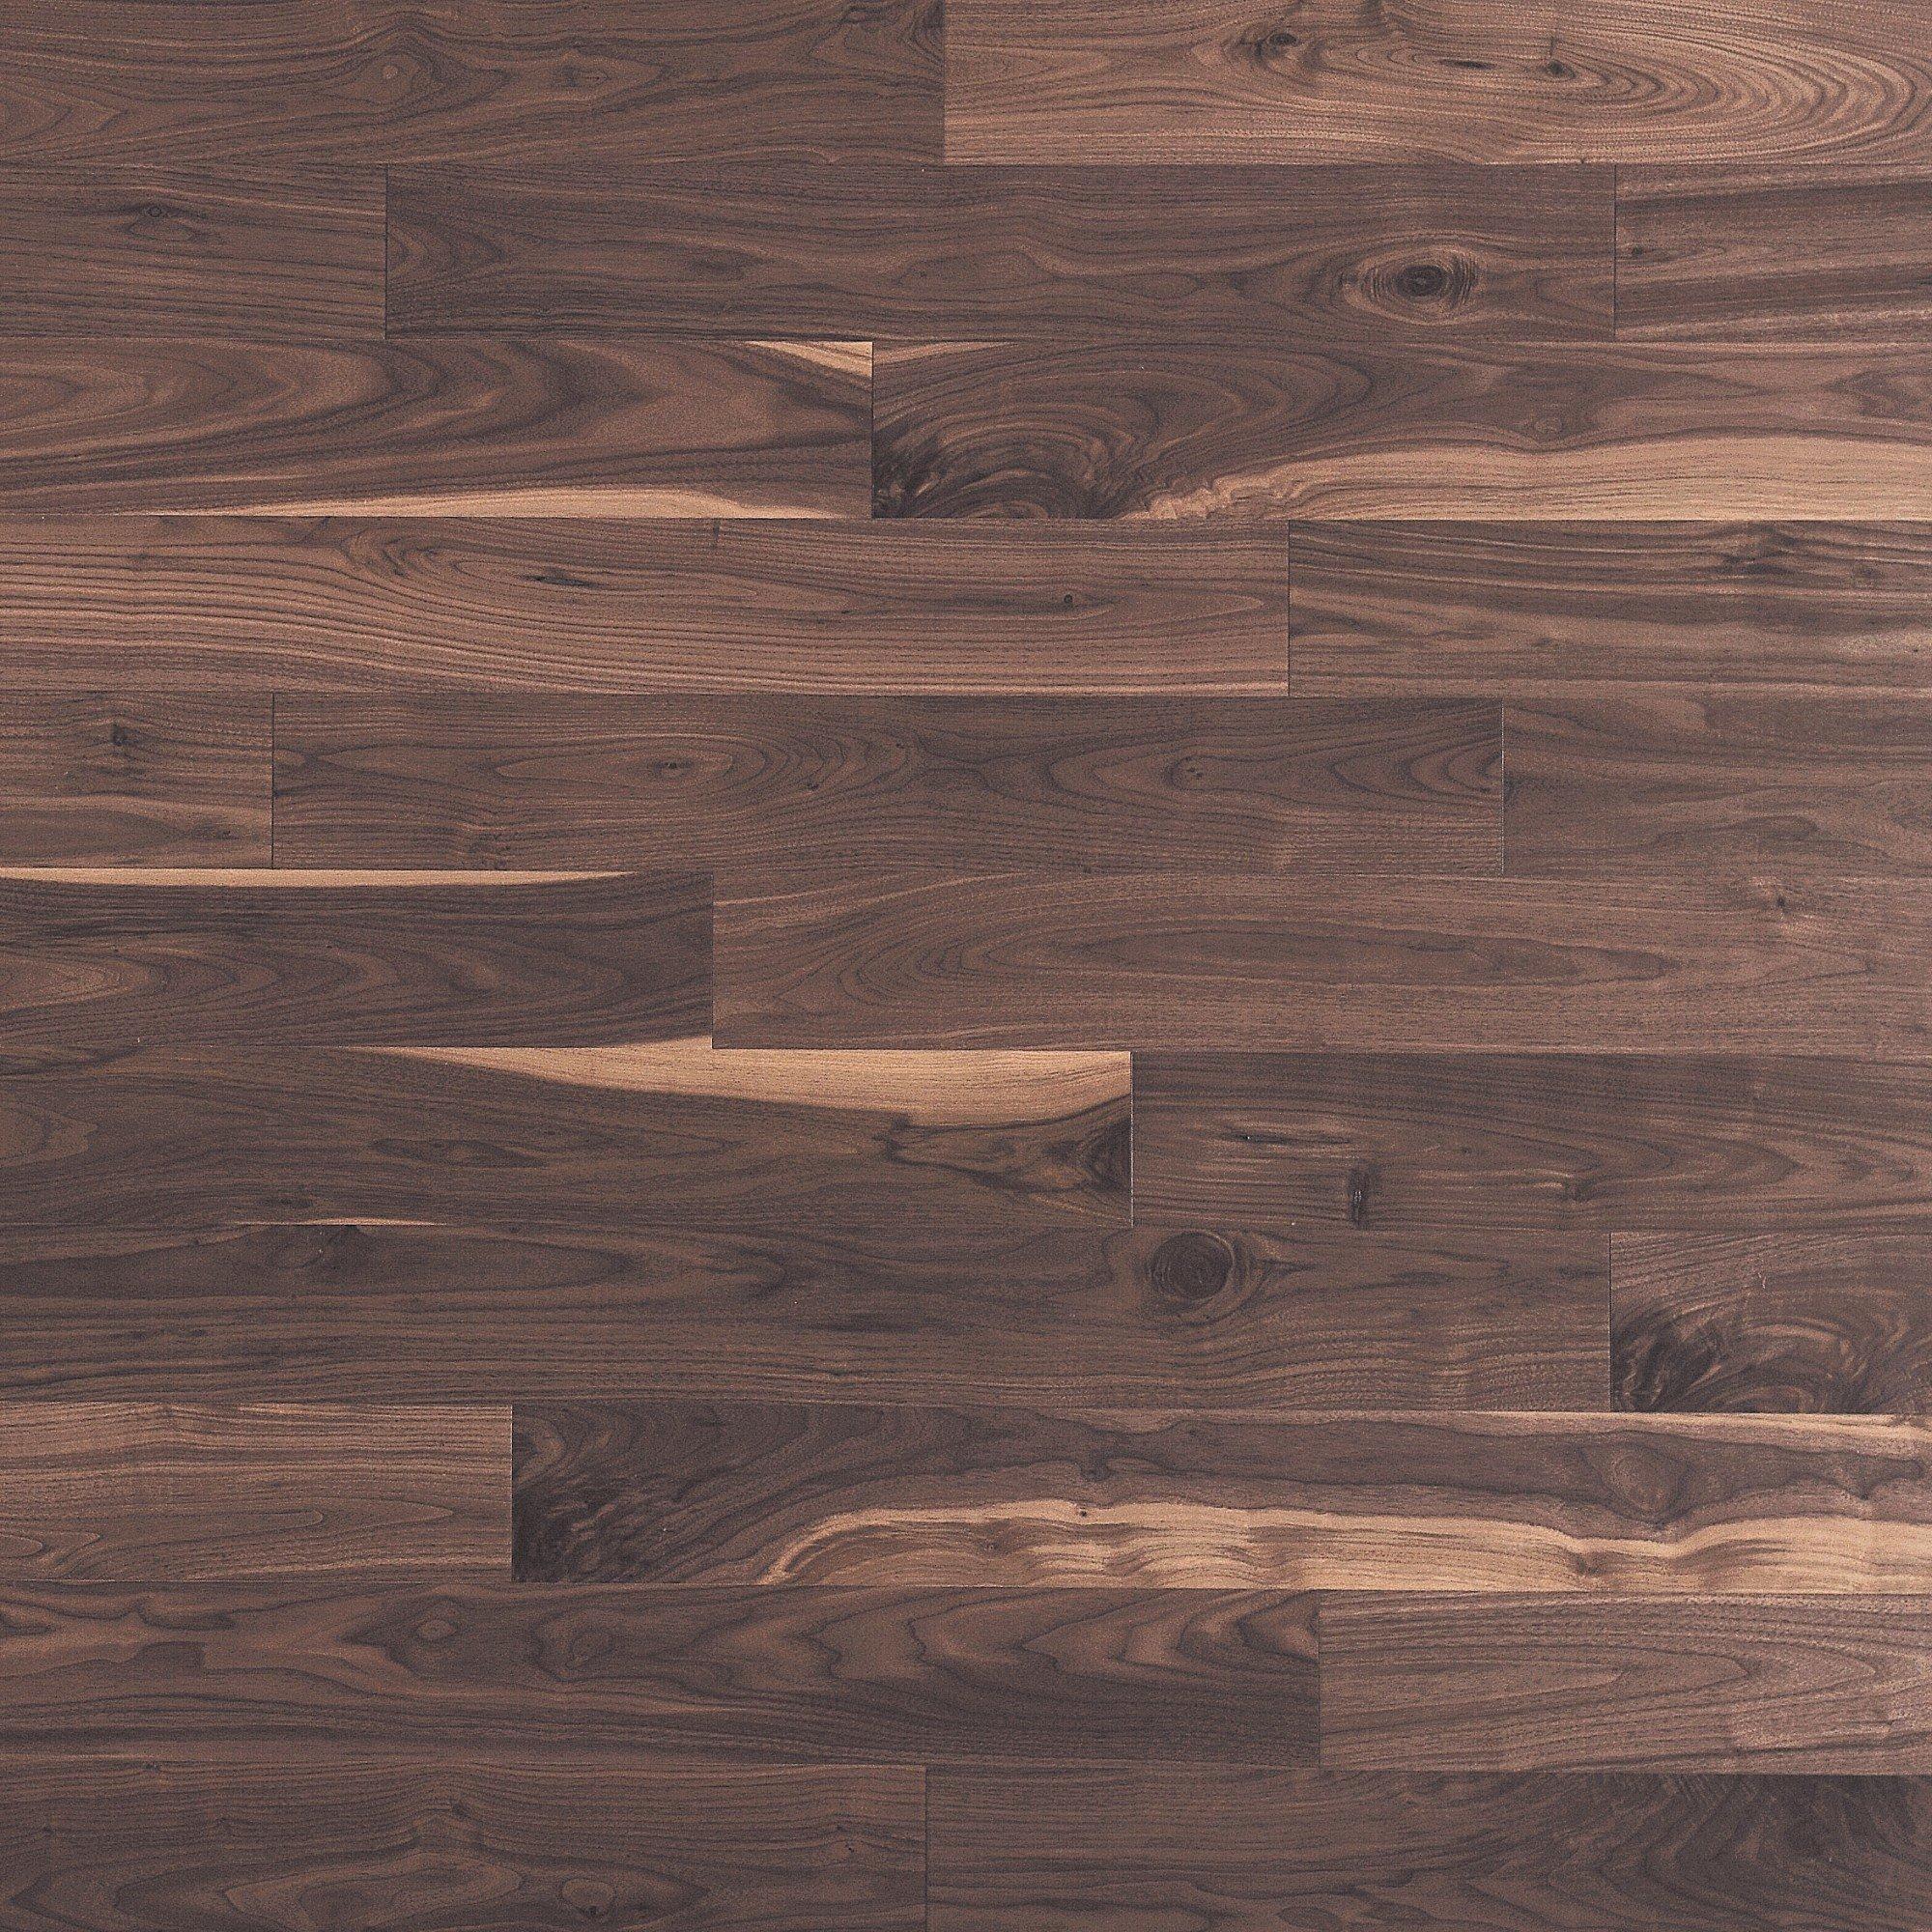 Walnut Character Smooth - Floor image